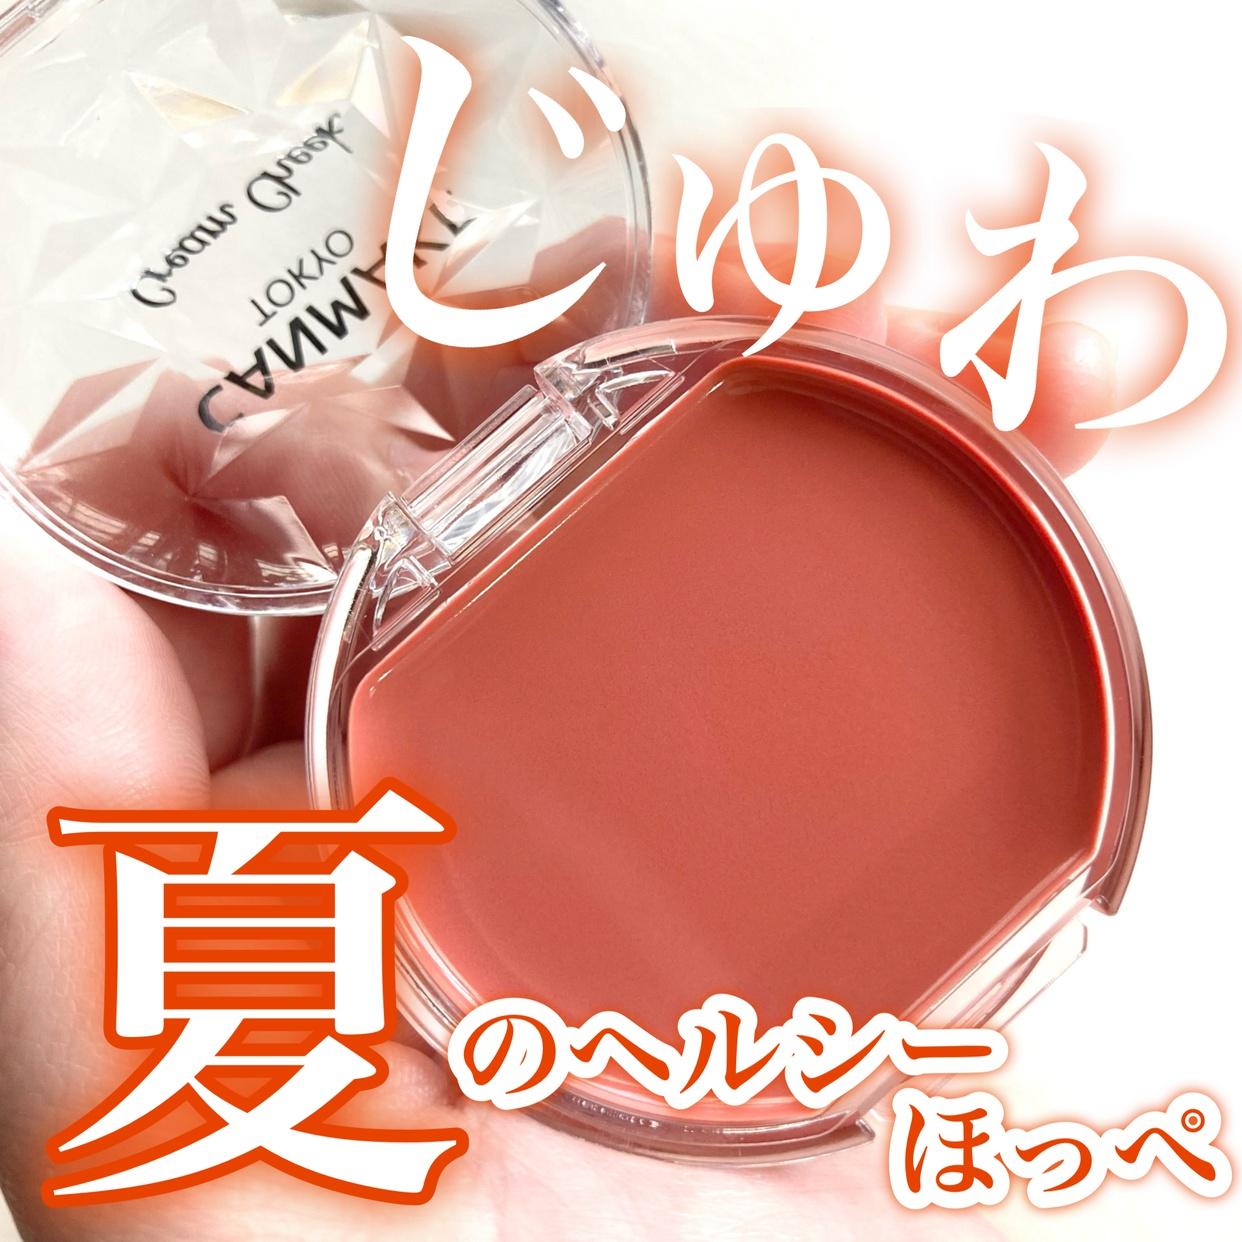 CANMAKE(キャンメイク)クリームチークを使った☆ふくすけ☆さんのクチコミ画像1